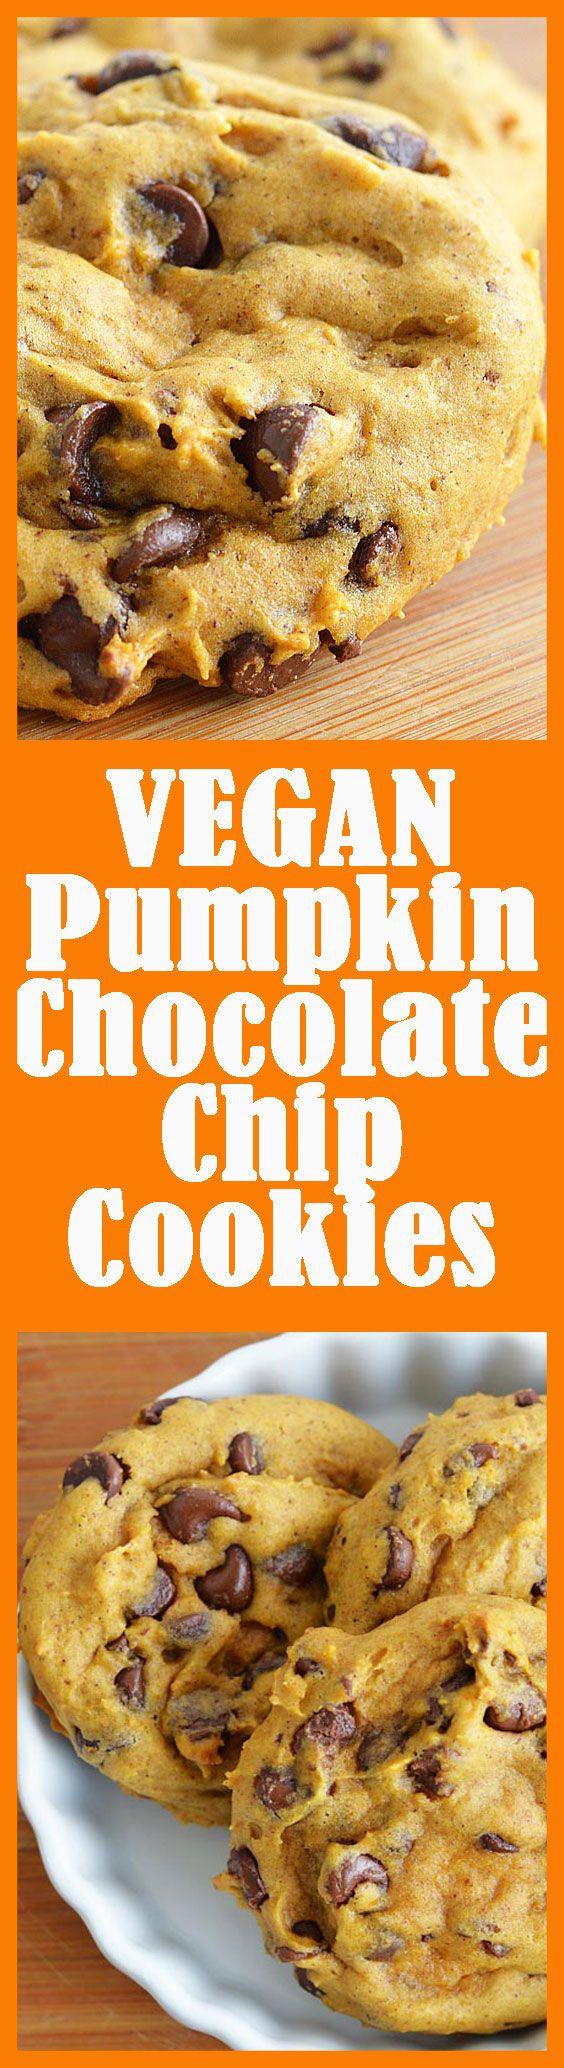 Vegan Pumpkin Chocolate Chip Cookies